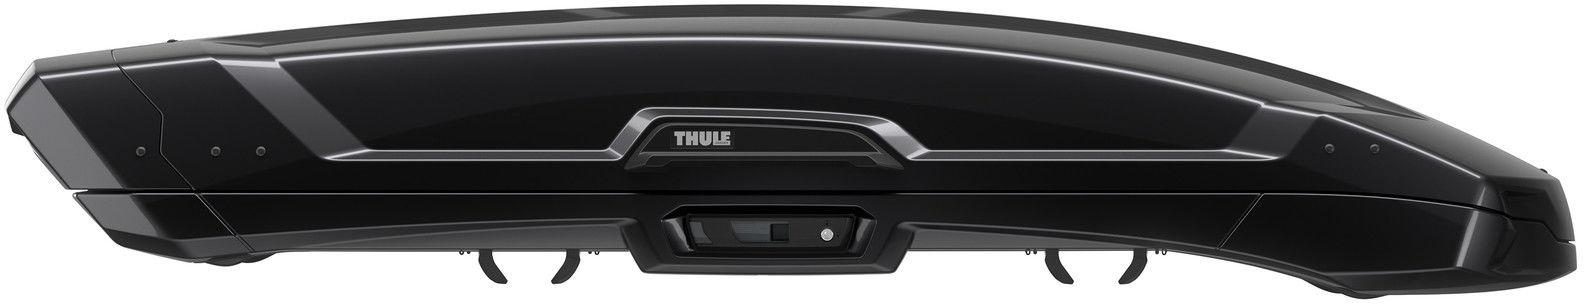 Thule Vector L Box dachowy Czarny połysk